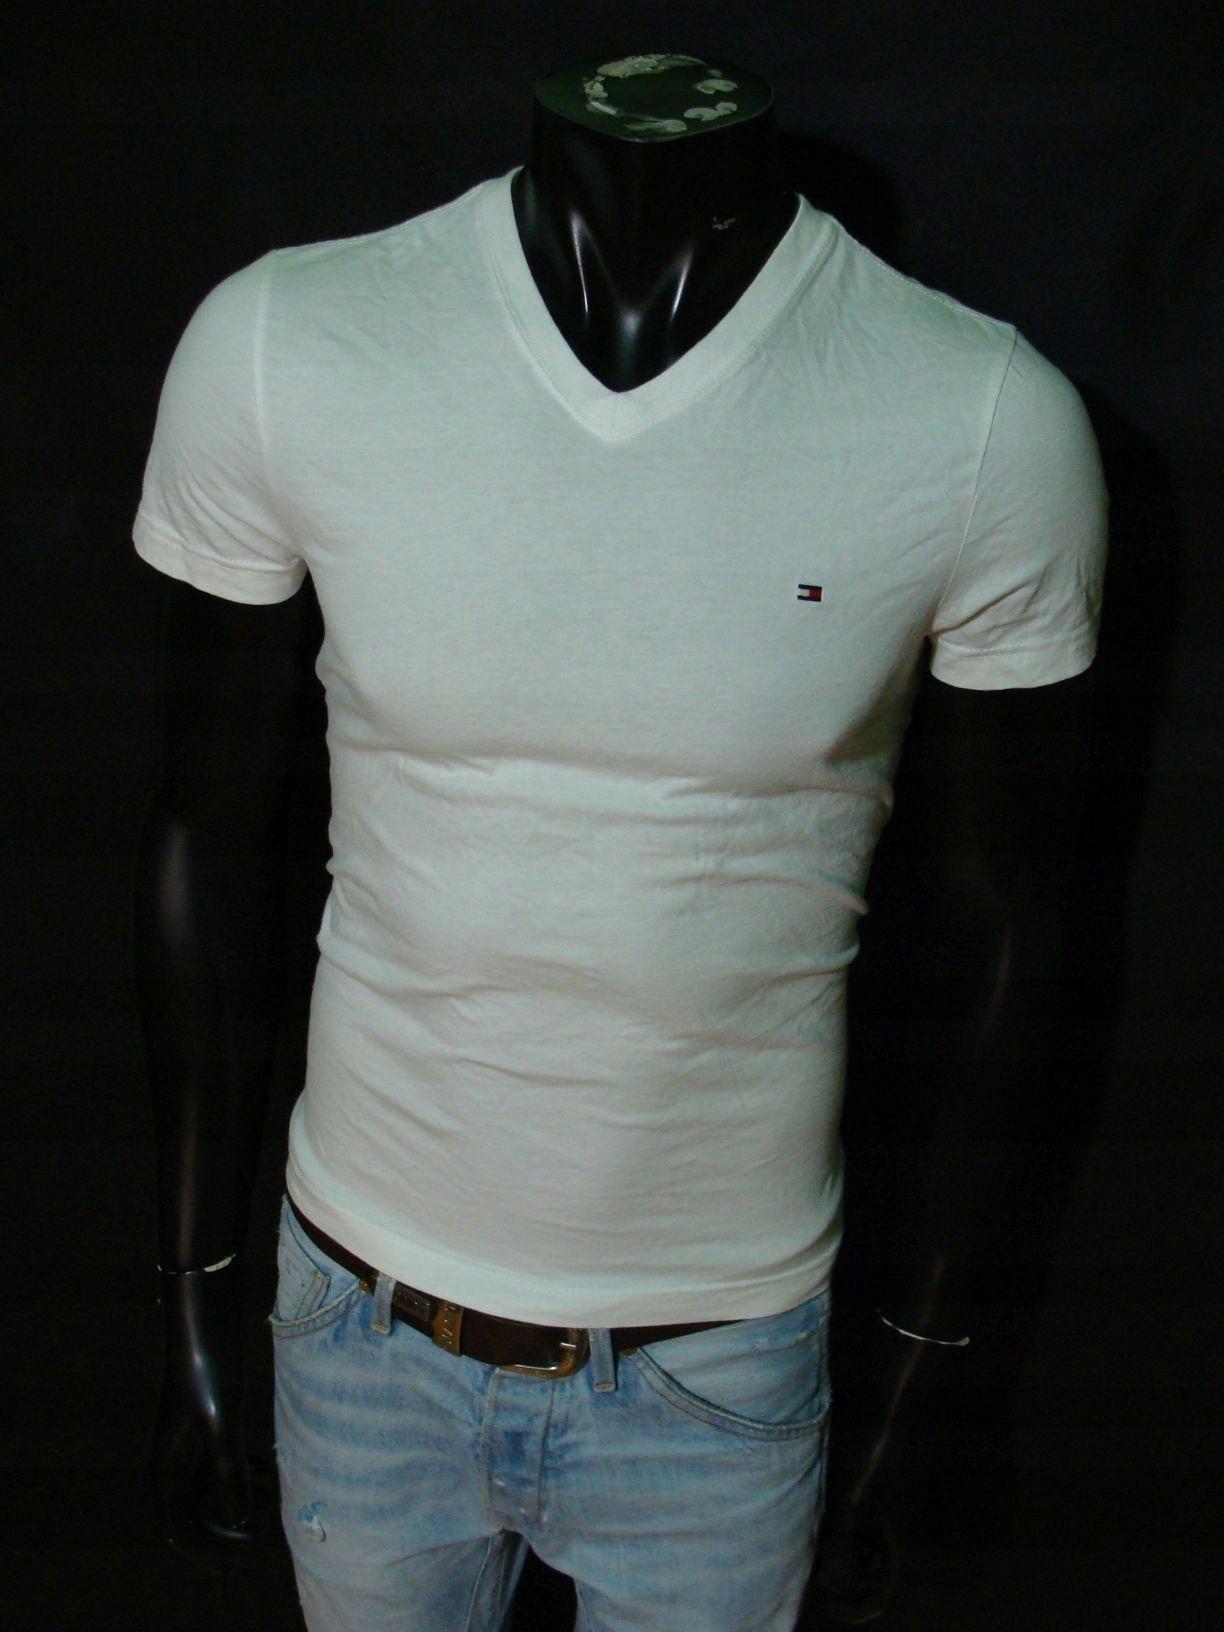 Tommy Hilfiger Denim basic tee szara koszulka z logiem męska